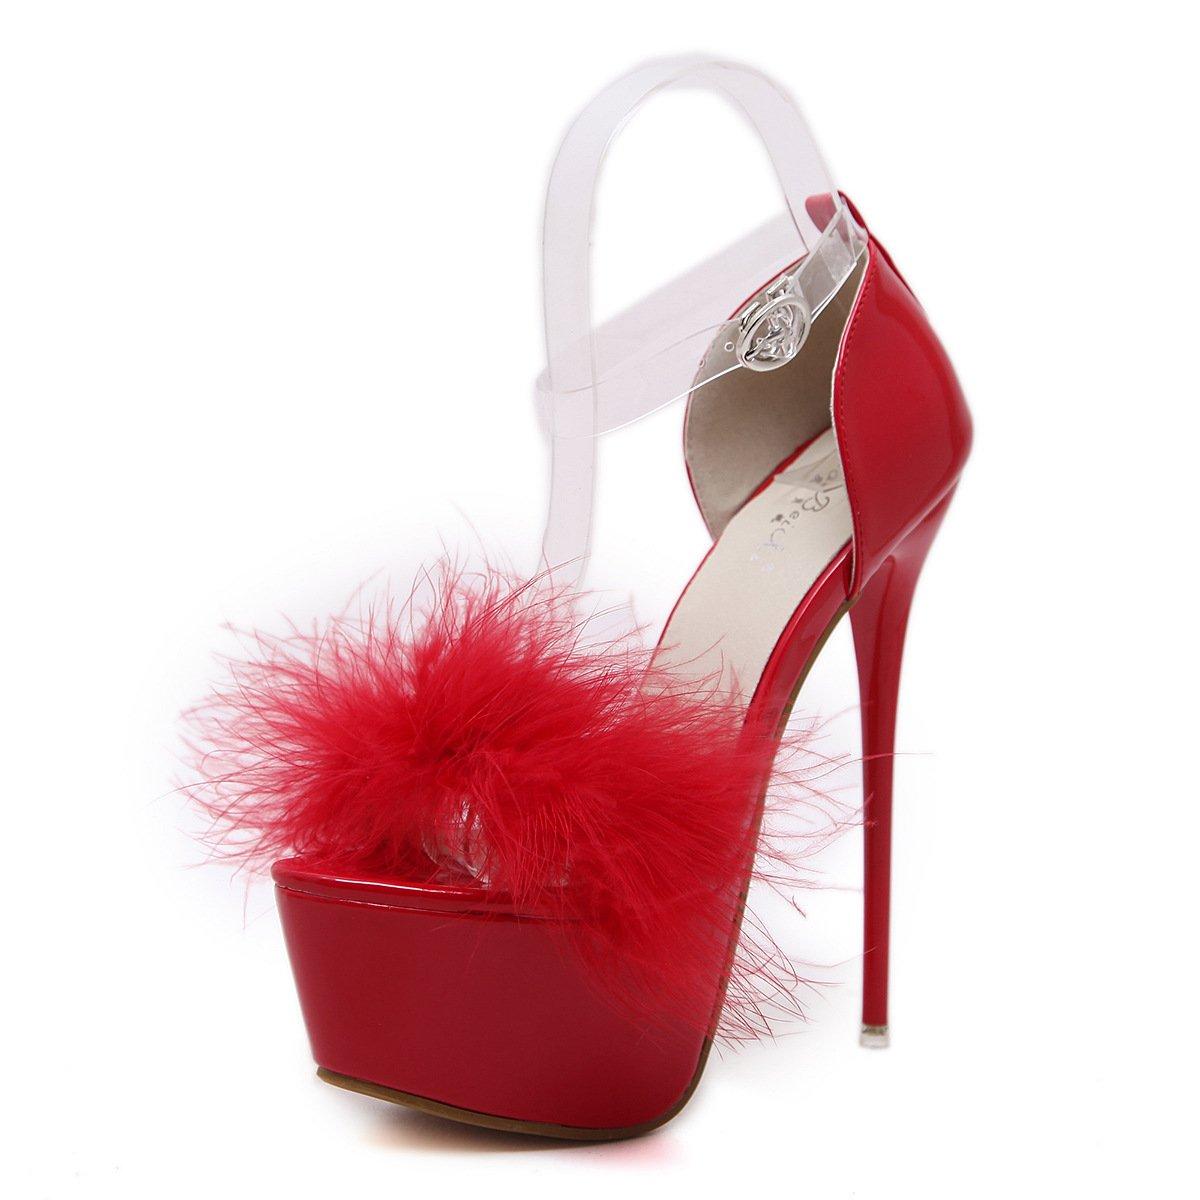 ZHZNVX ZHZNVX ZHZNVX Frühling neue high-heel Schuhe wasserdicht Taiwan dick fein mit einzelnen Schuhe Frauen Schuhe 4497a9